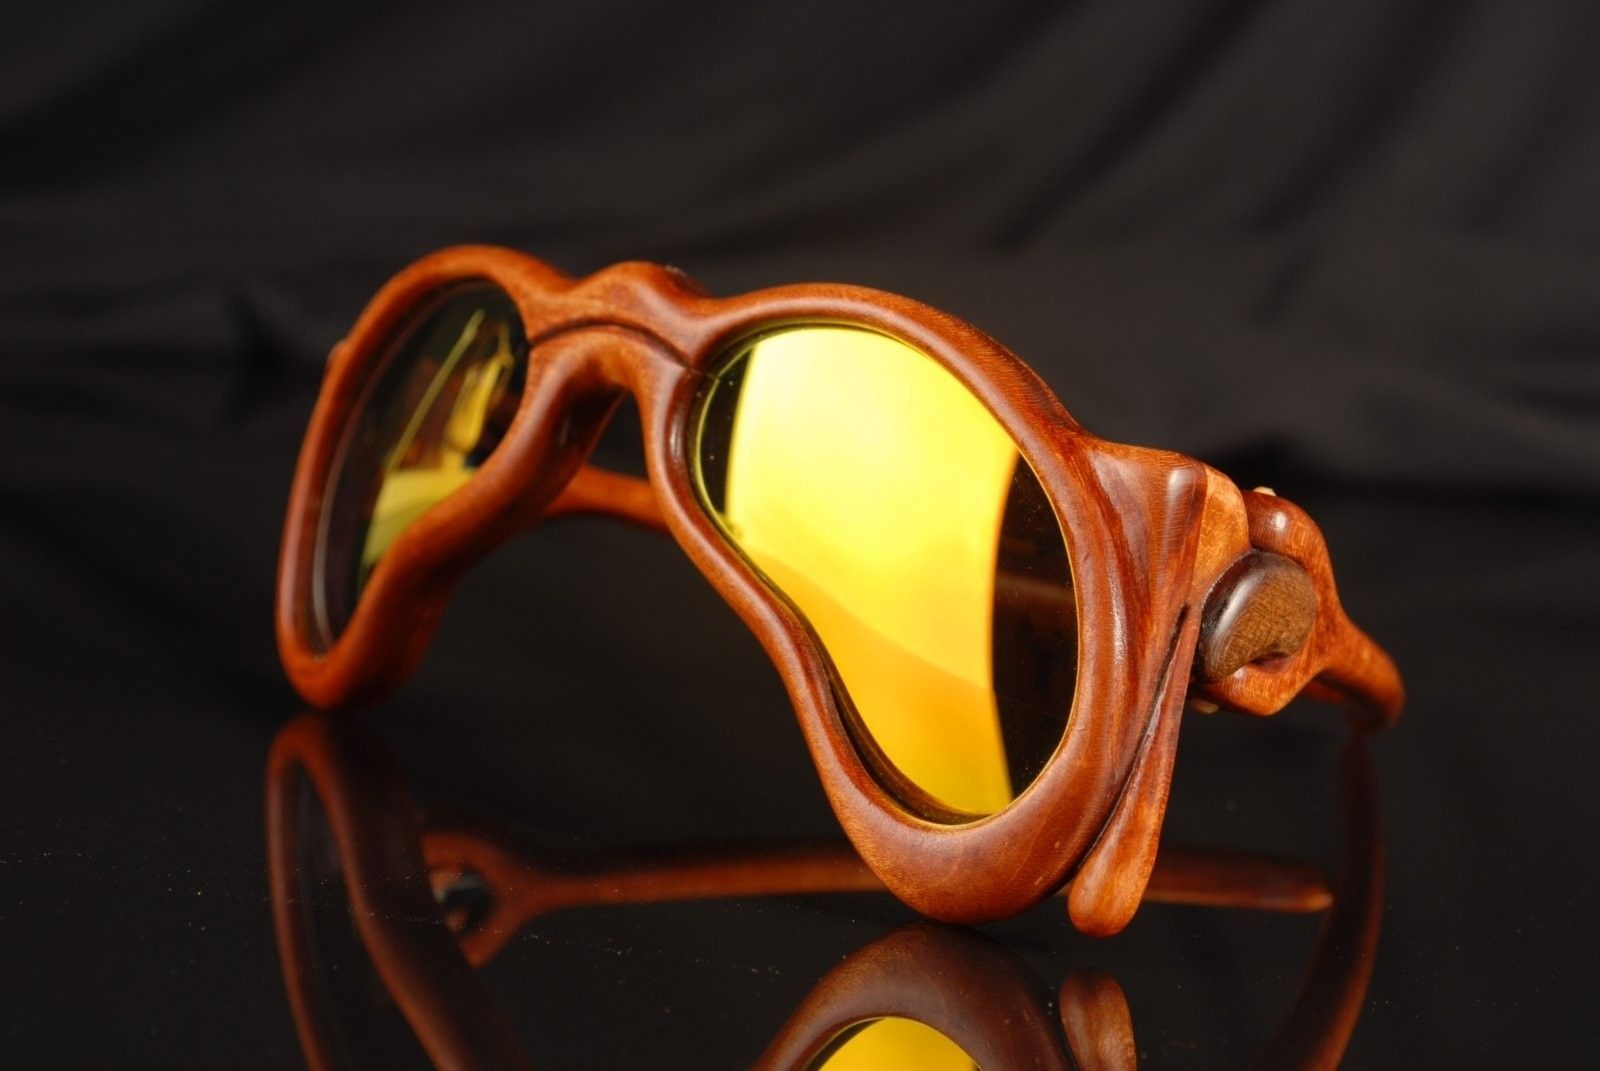 Spectacular Handmade Wooden Sunglasses - 2016-05 Jaromir Dali 25.JPG